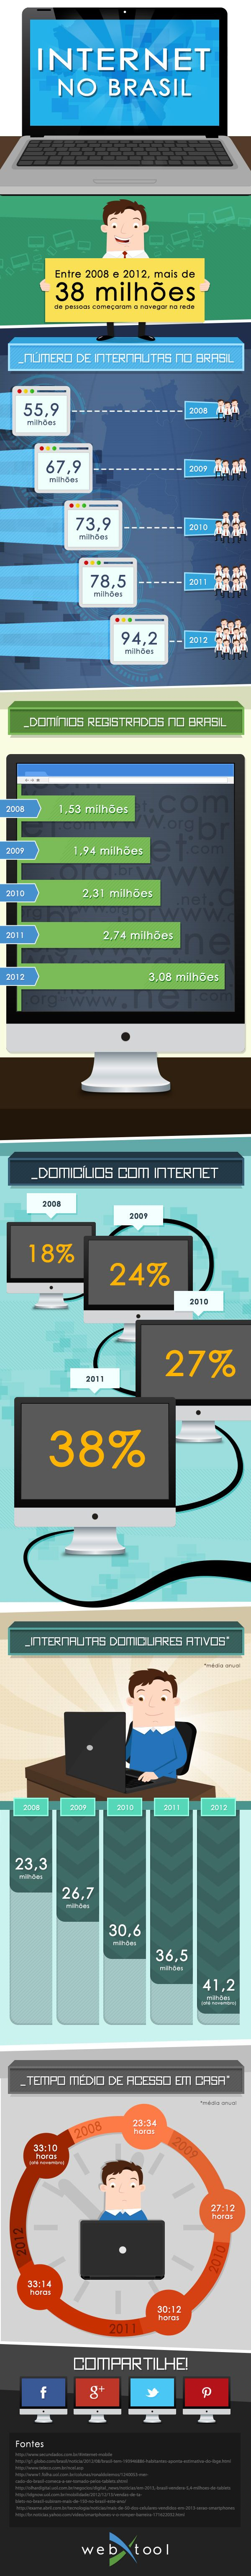 Infográfico mostra panorama da internet brasileira nos últimos anos.